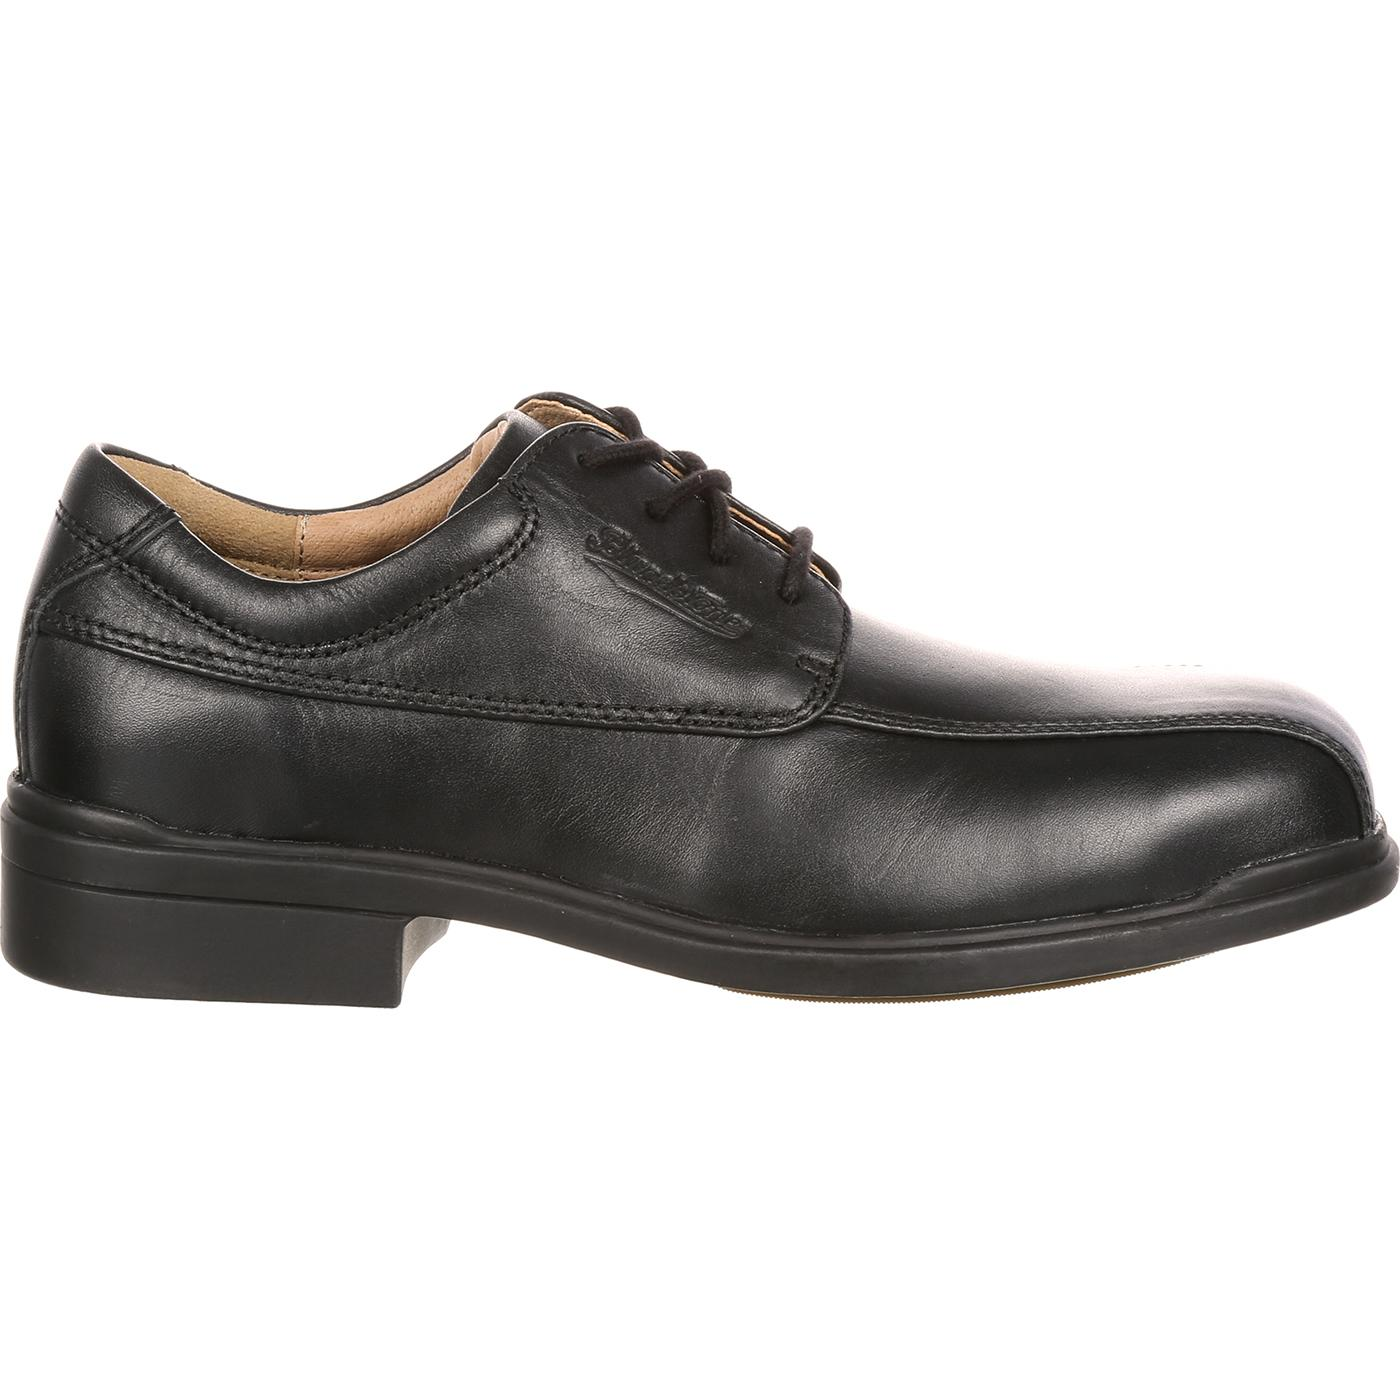 blundstone executive steel toe dress oxford work shoe blu780